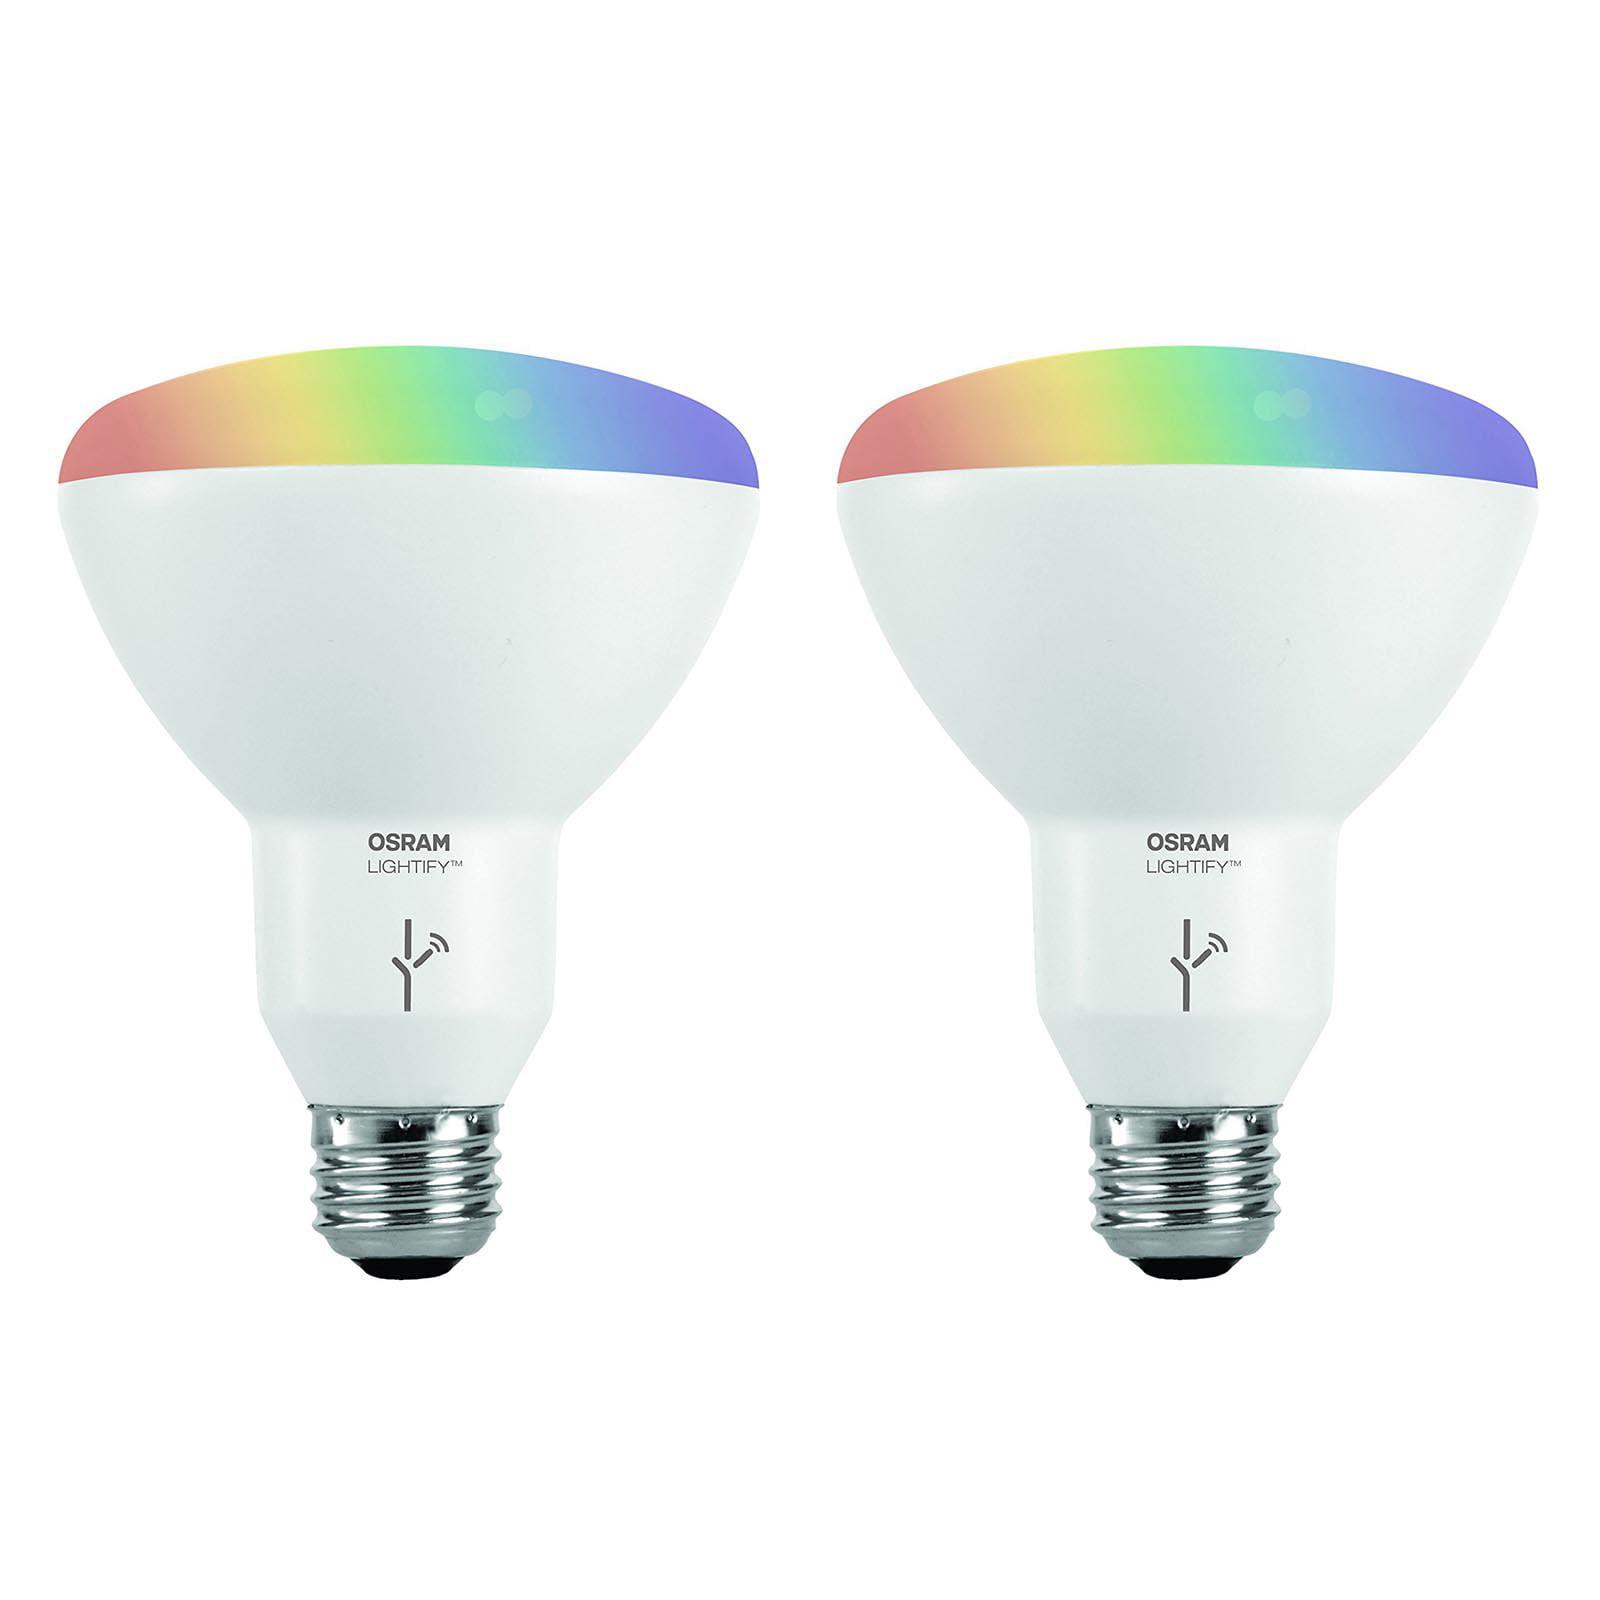 Sylvania Osram Lightify Smart Home 65W BR30 White/ Color LED Light Bulb (6 Pack) - image 2 of 9